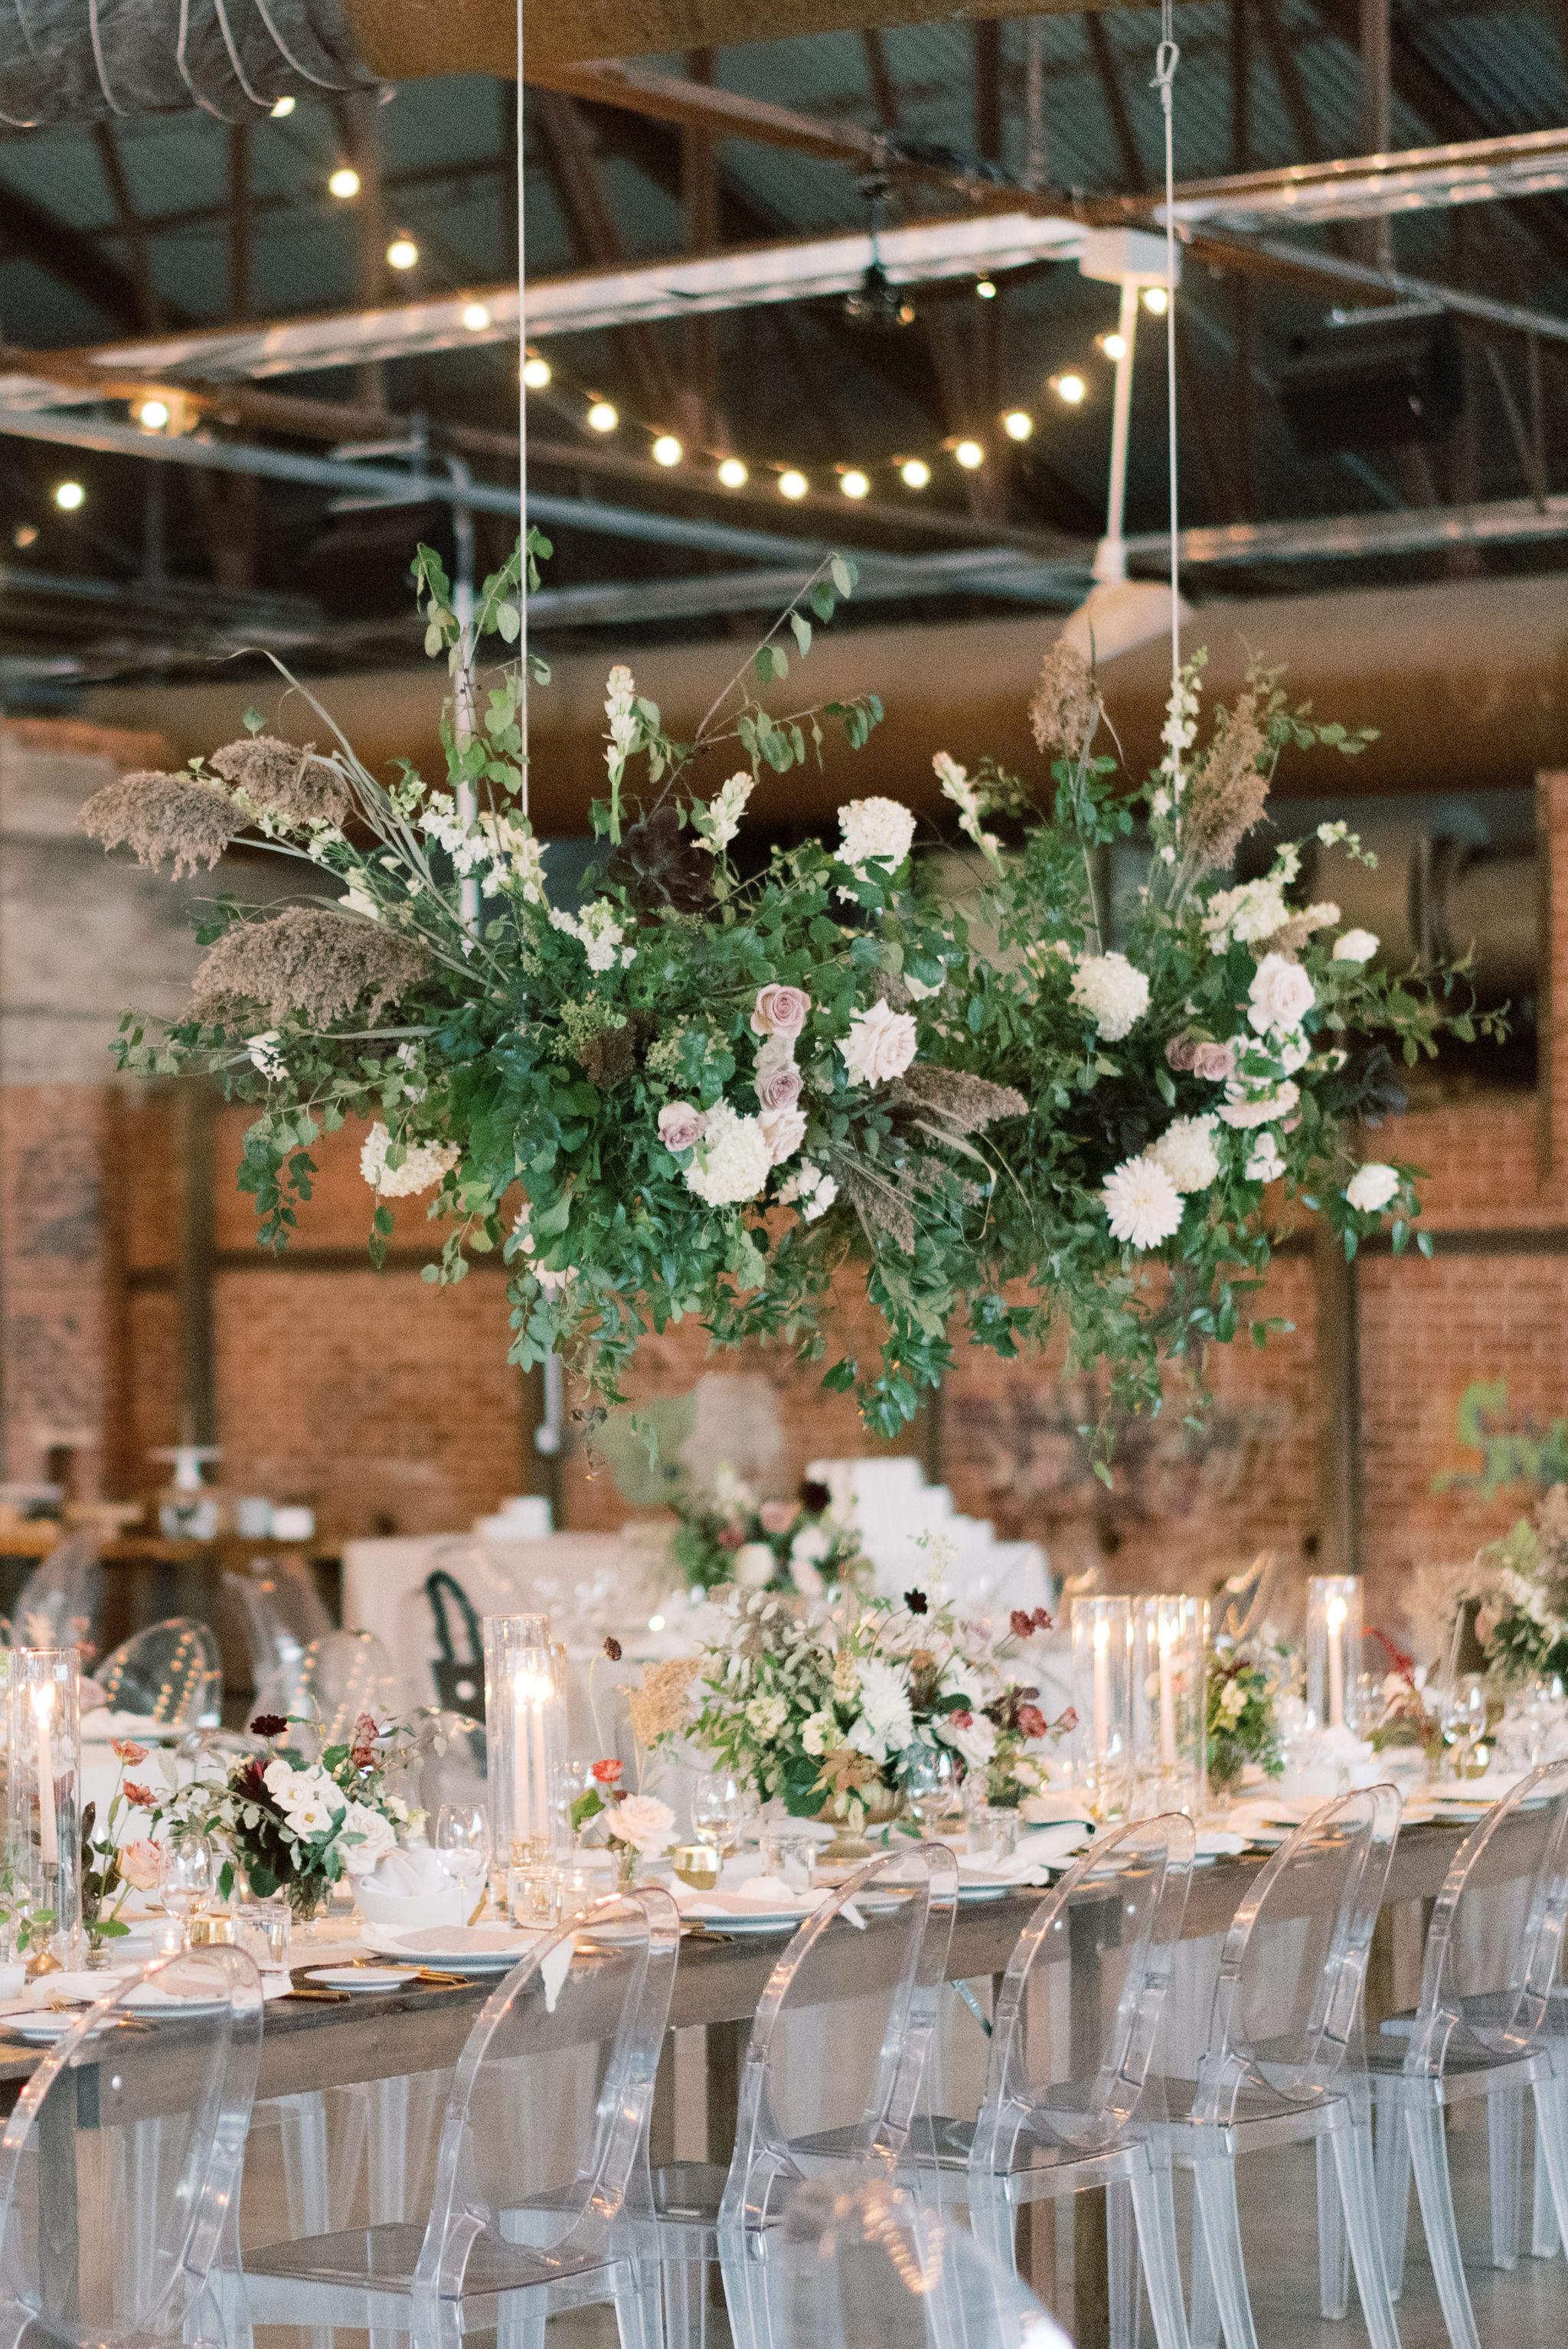 1375-artiese-evergreen-brickworks-wedding-ashleycraig-10538-2.jpg